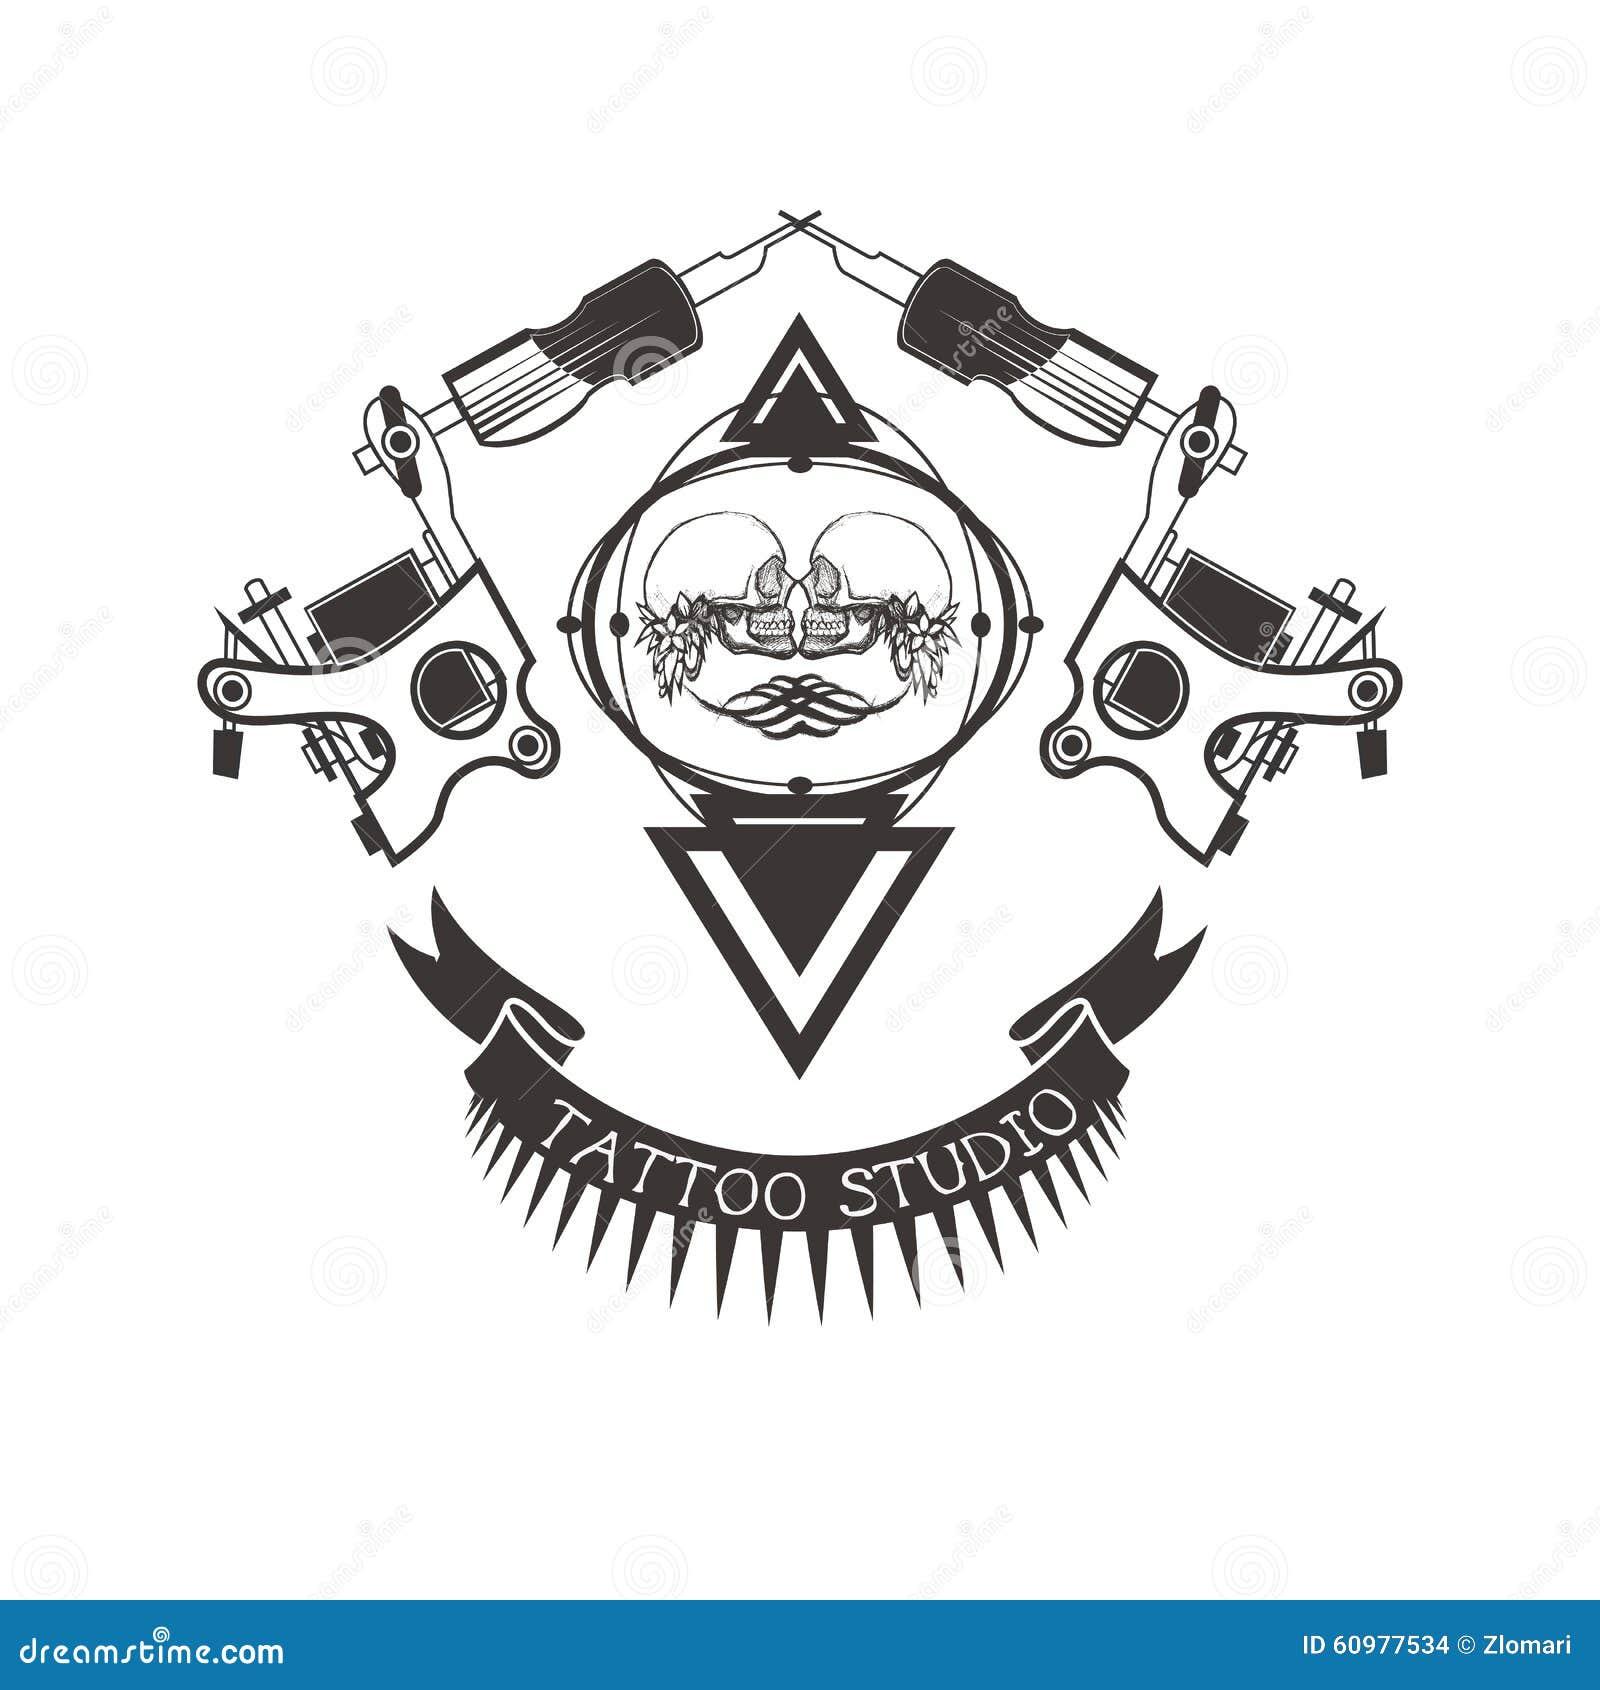 Tattoo Studio Logo, Emblem Stock Vector - Image: 60977534